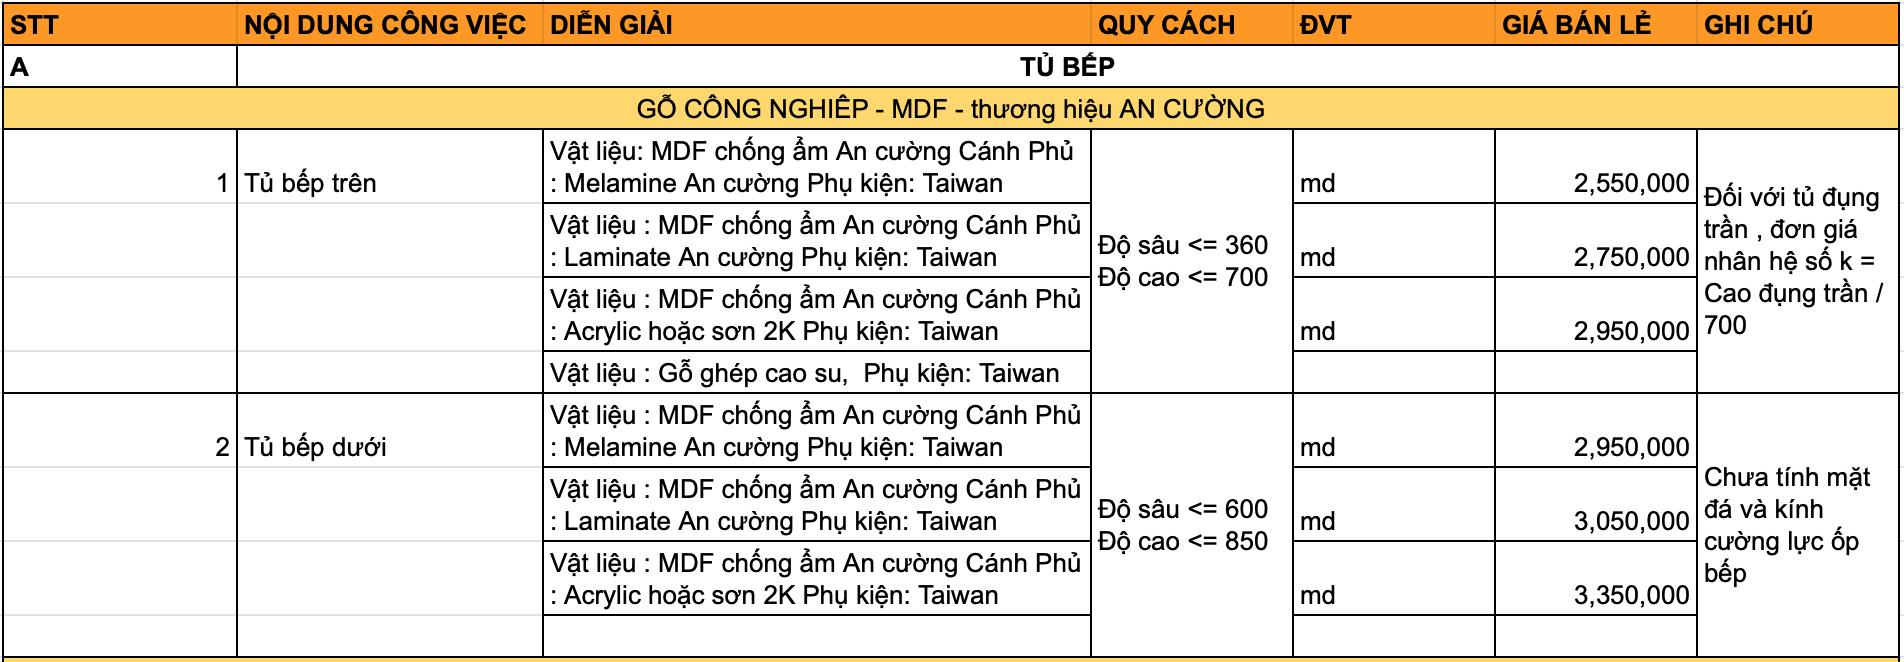 bang-bao-gia-thiet-ke-va-thi-cong-tu-bep-dep-2021